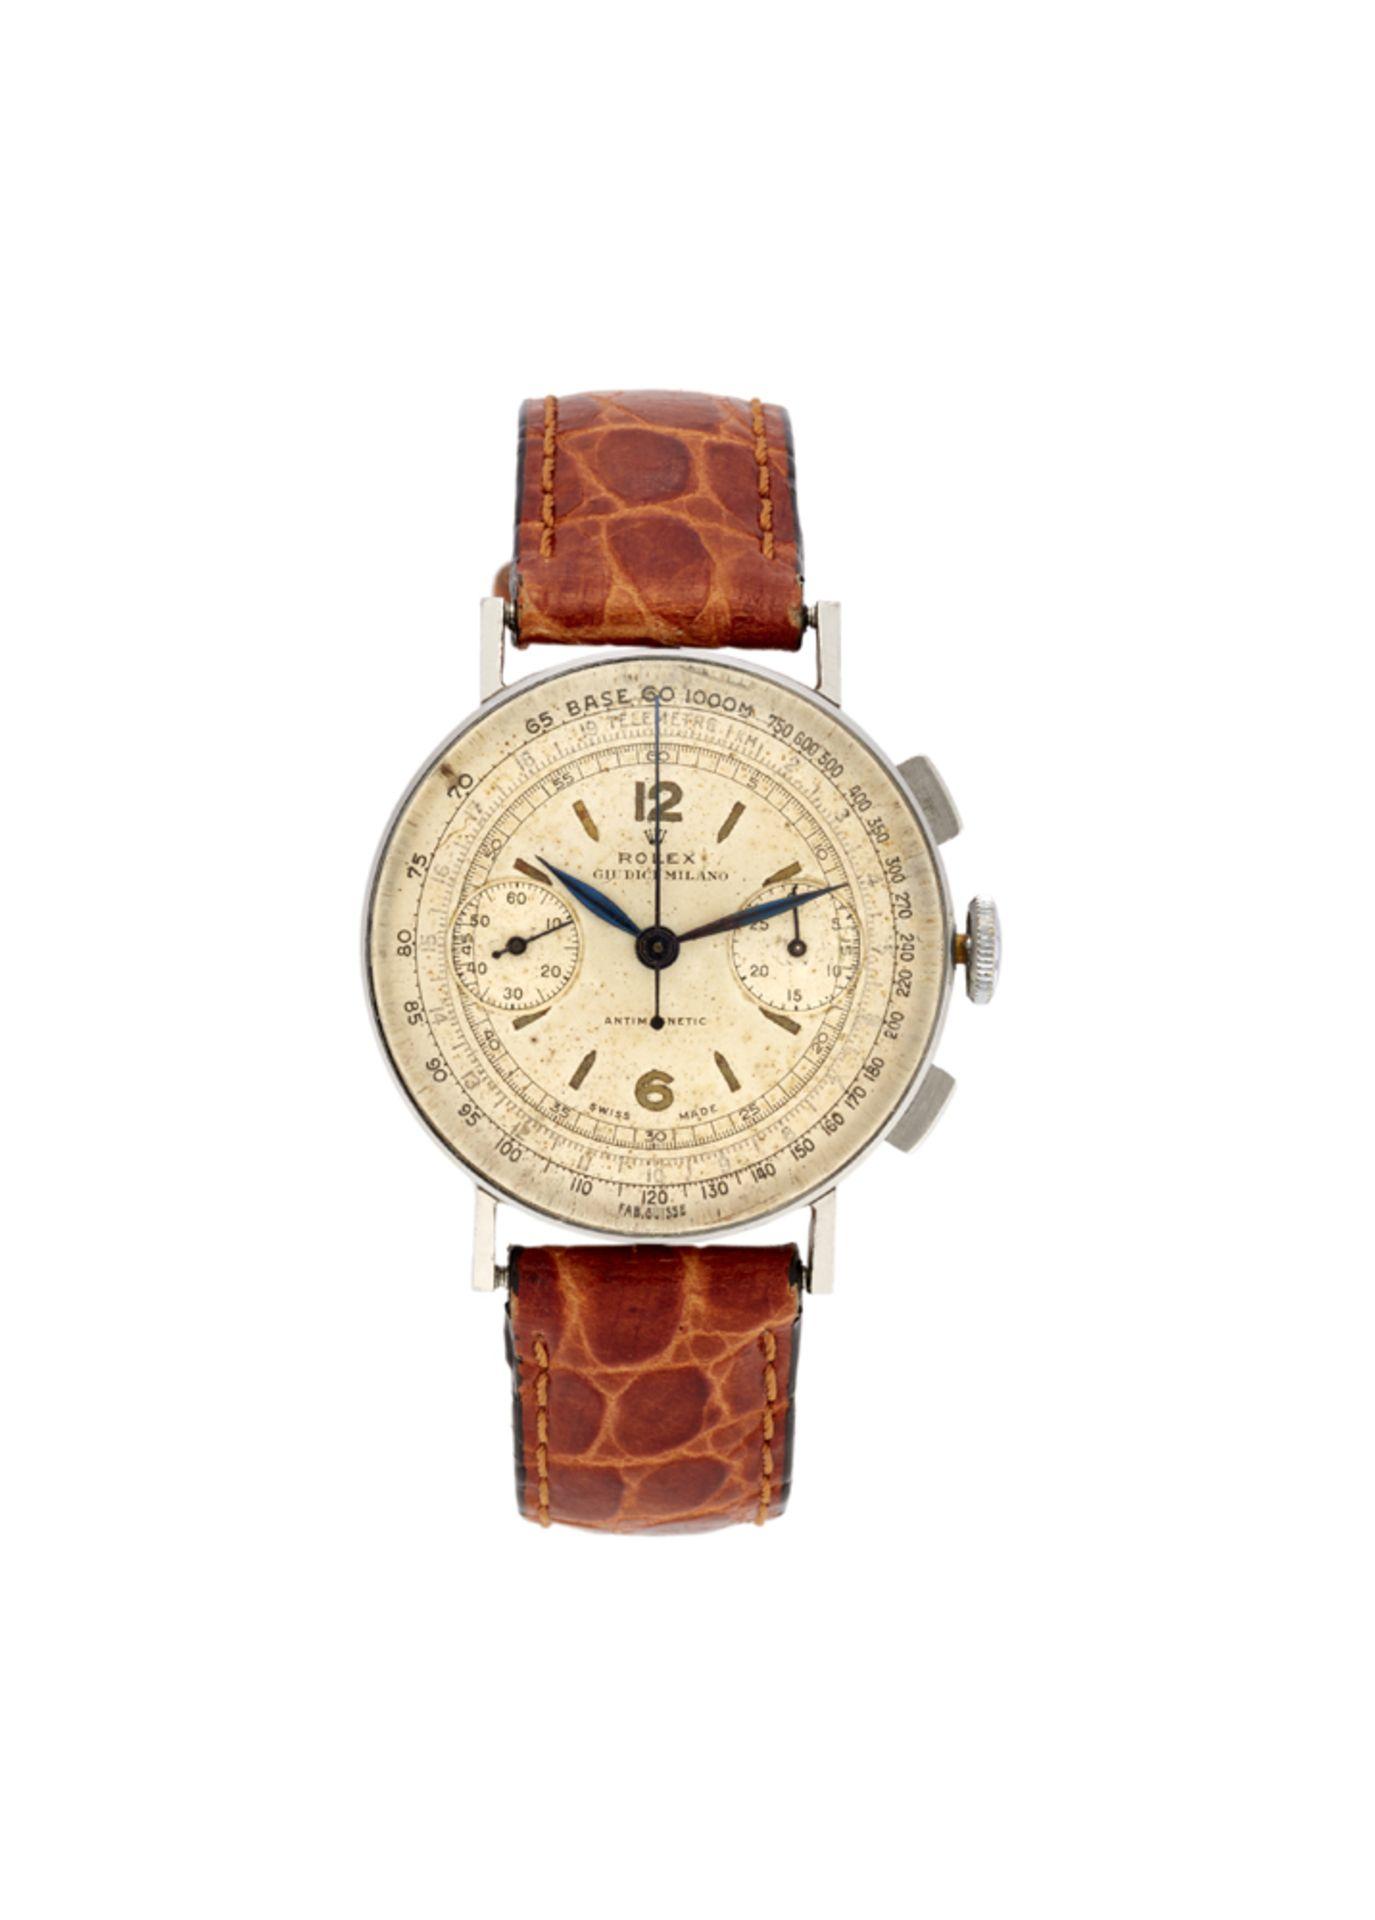 ROLEX GIUDICI MILANOGent's steel wristwatch1940sDial, movement and case signedManual-wind